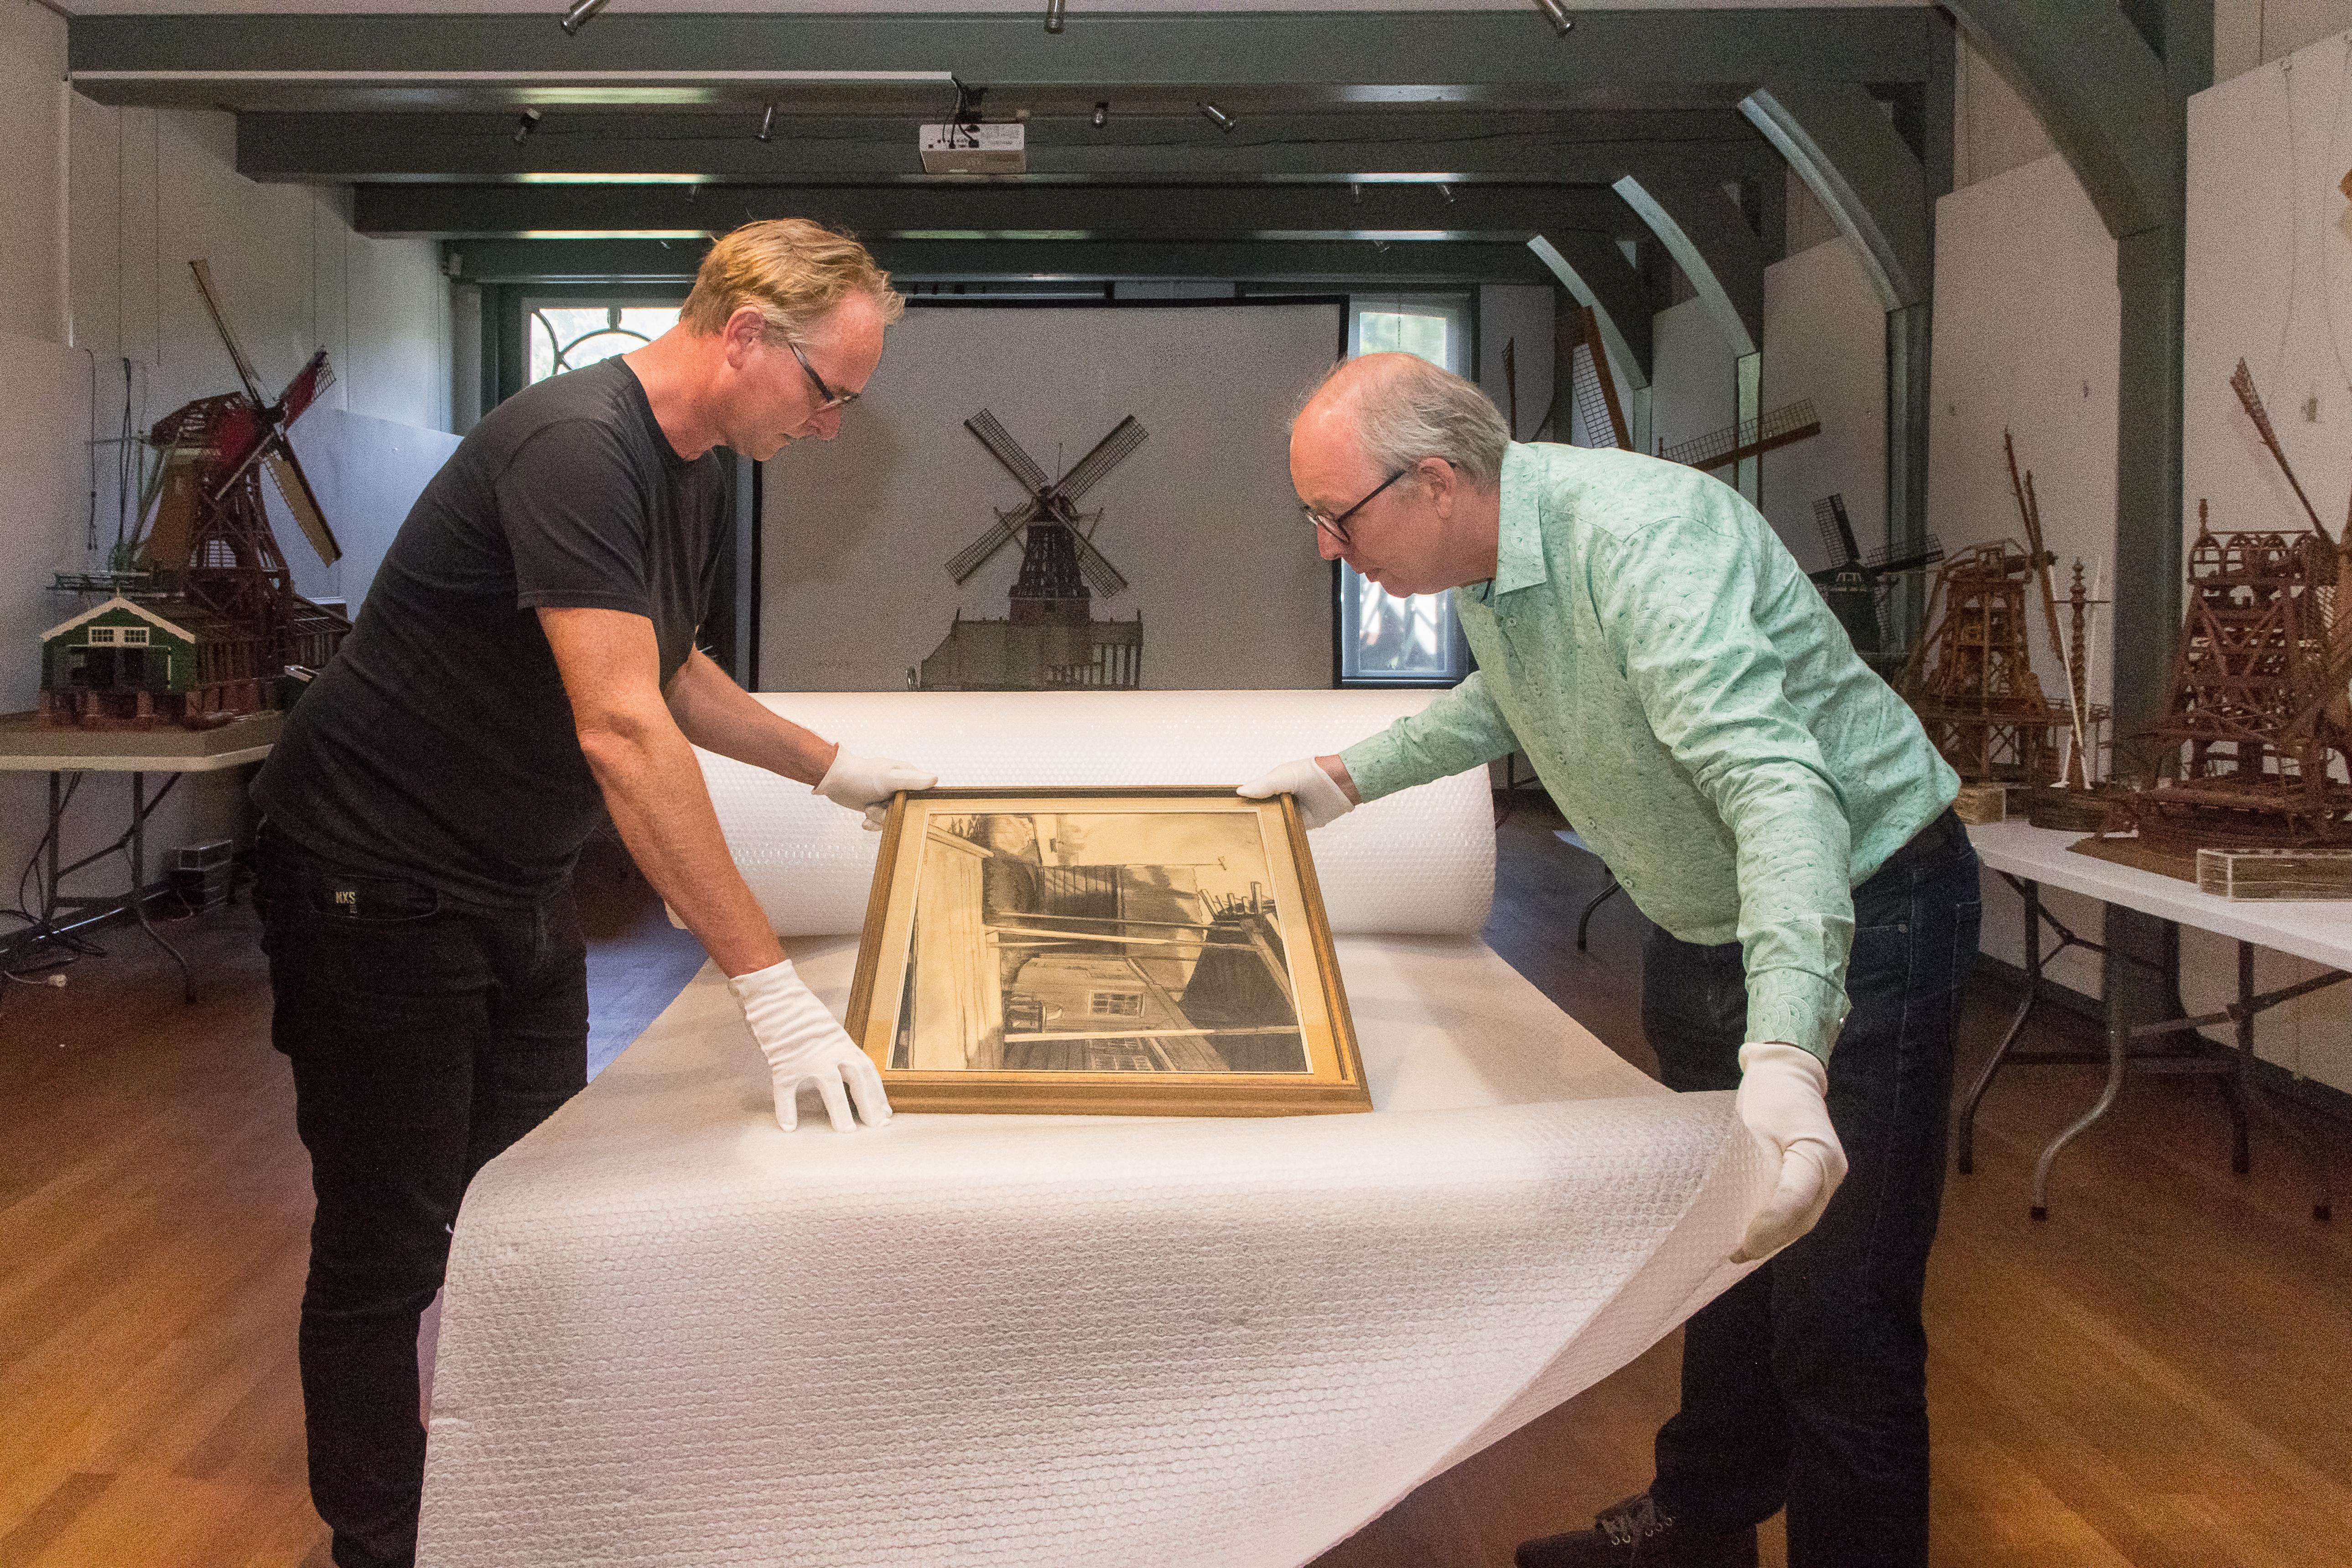 Conservator Molenmuseum kan wakker liggen van verhuizing molenmodel